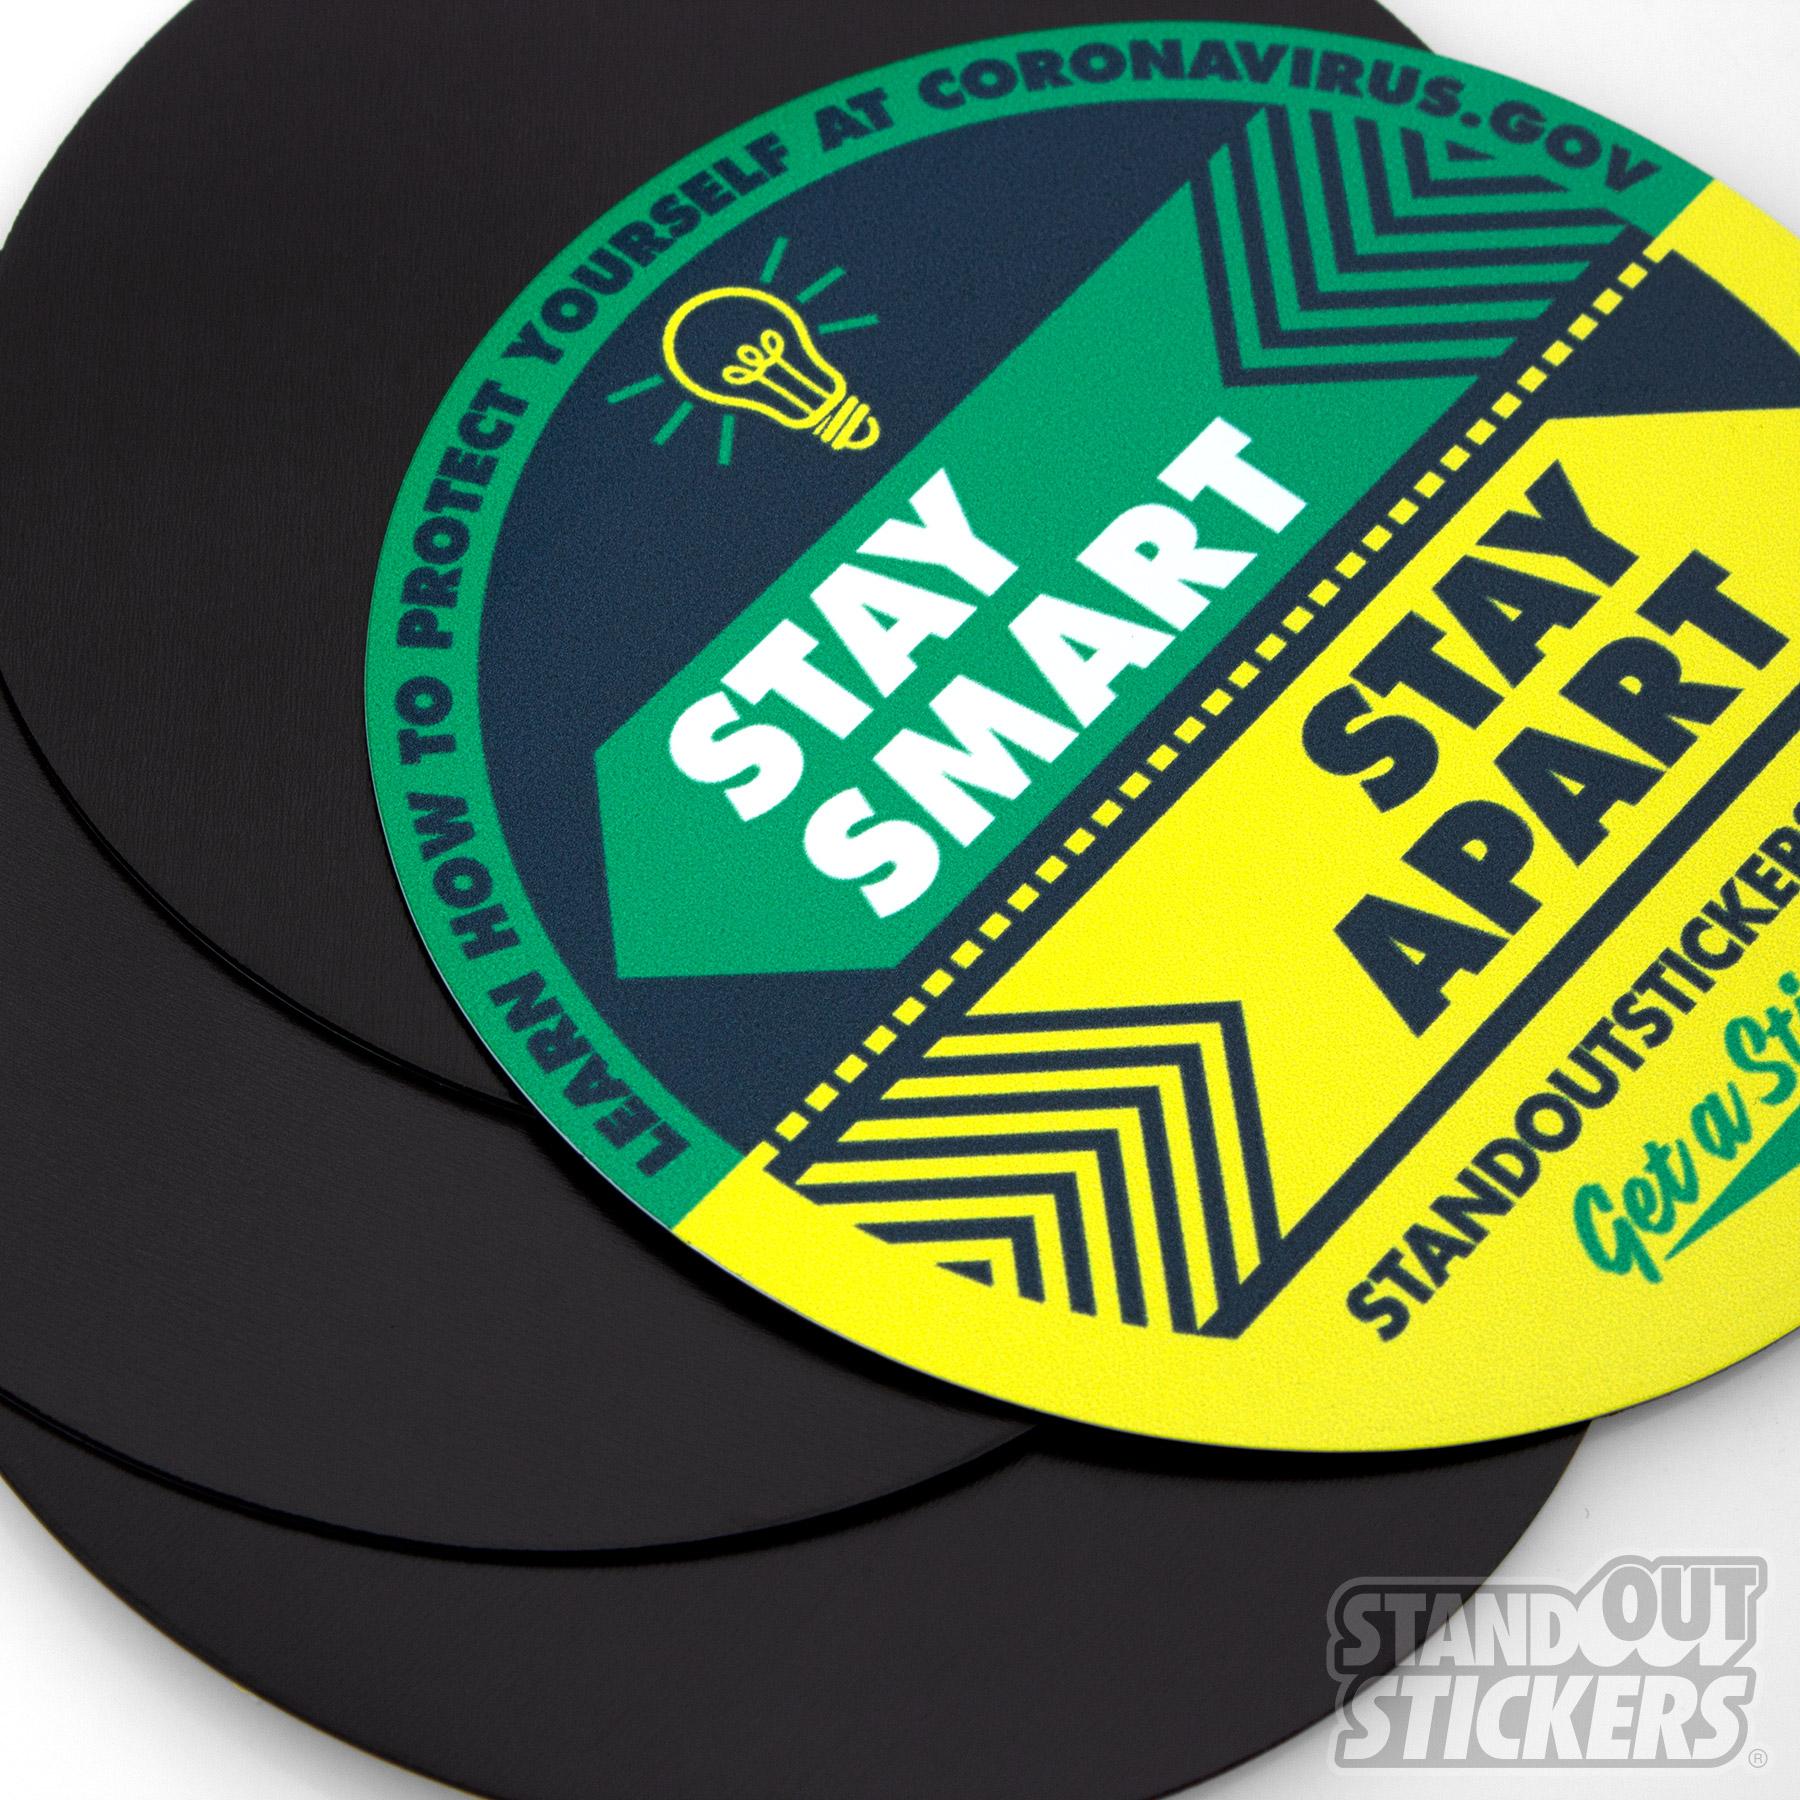 Coronavirus Magnets - Stay Smart, Stay Apart